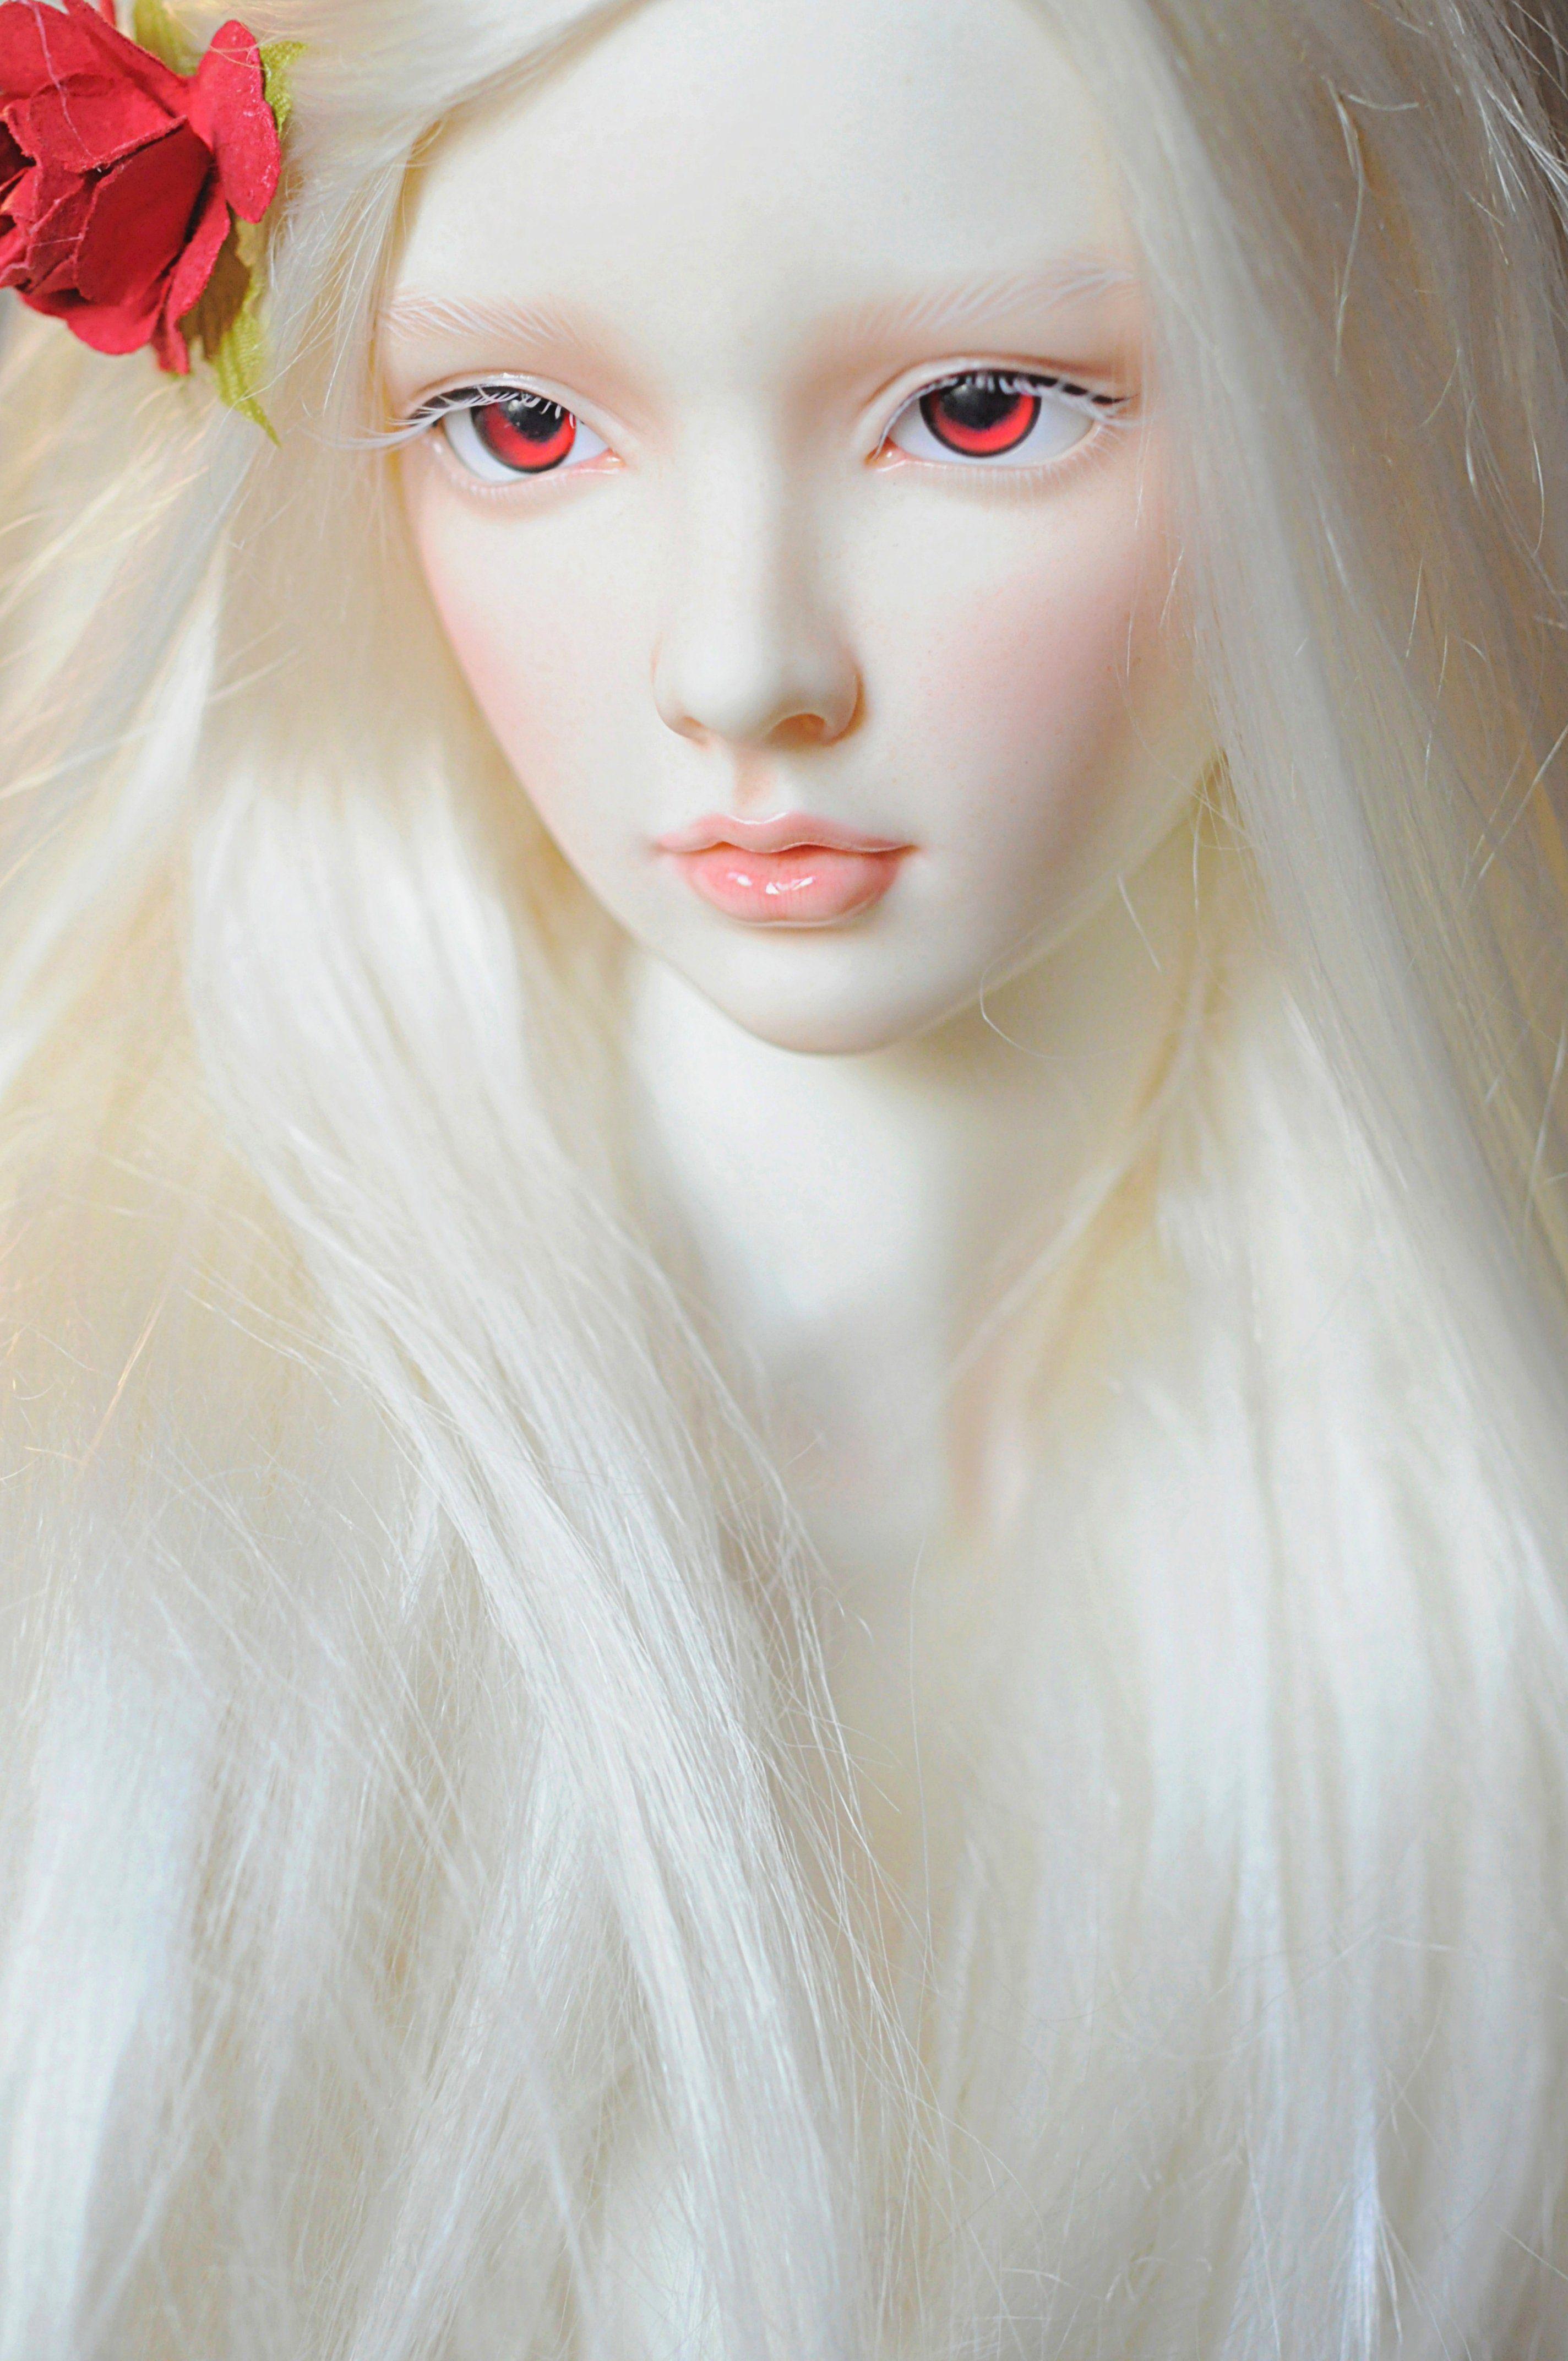 Doll Baby Toys Girl Beautiful Long Hair Red Eyes Rose Blonde Cute Wallpaper 2848x4288 781366 Rose Blonde Beautiful Long Hair Long Hair Styles